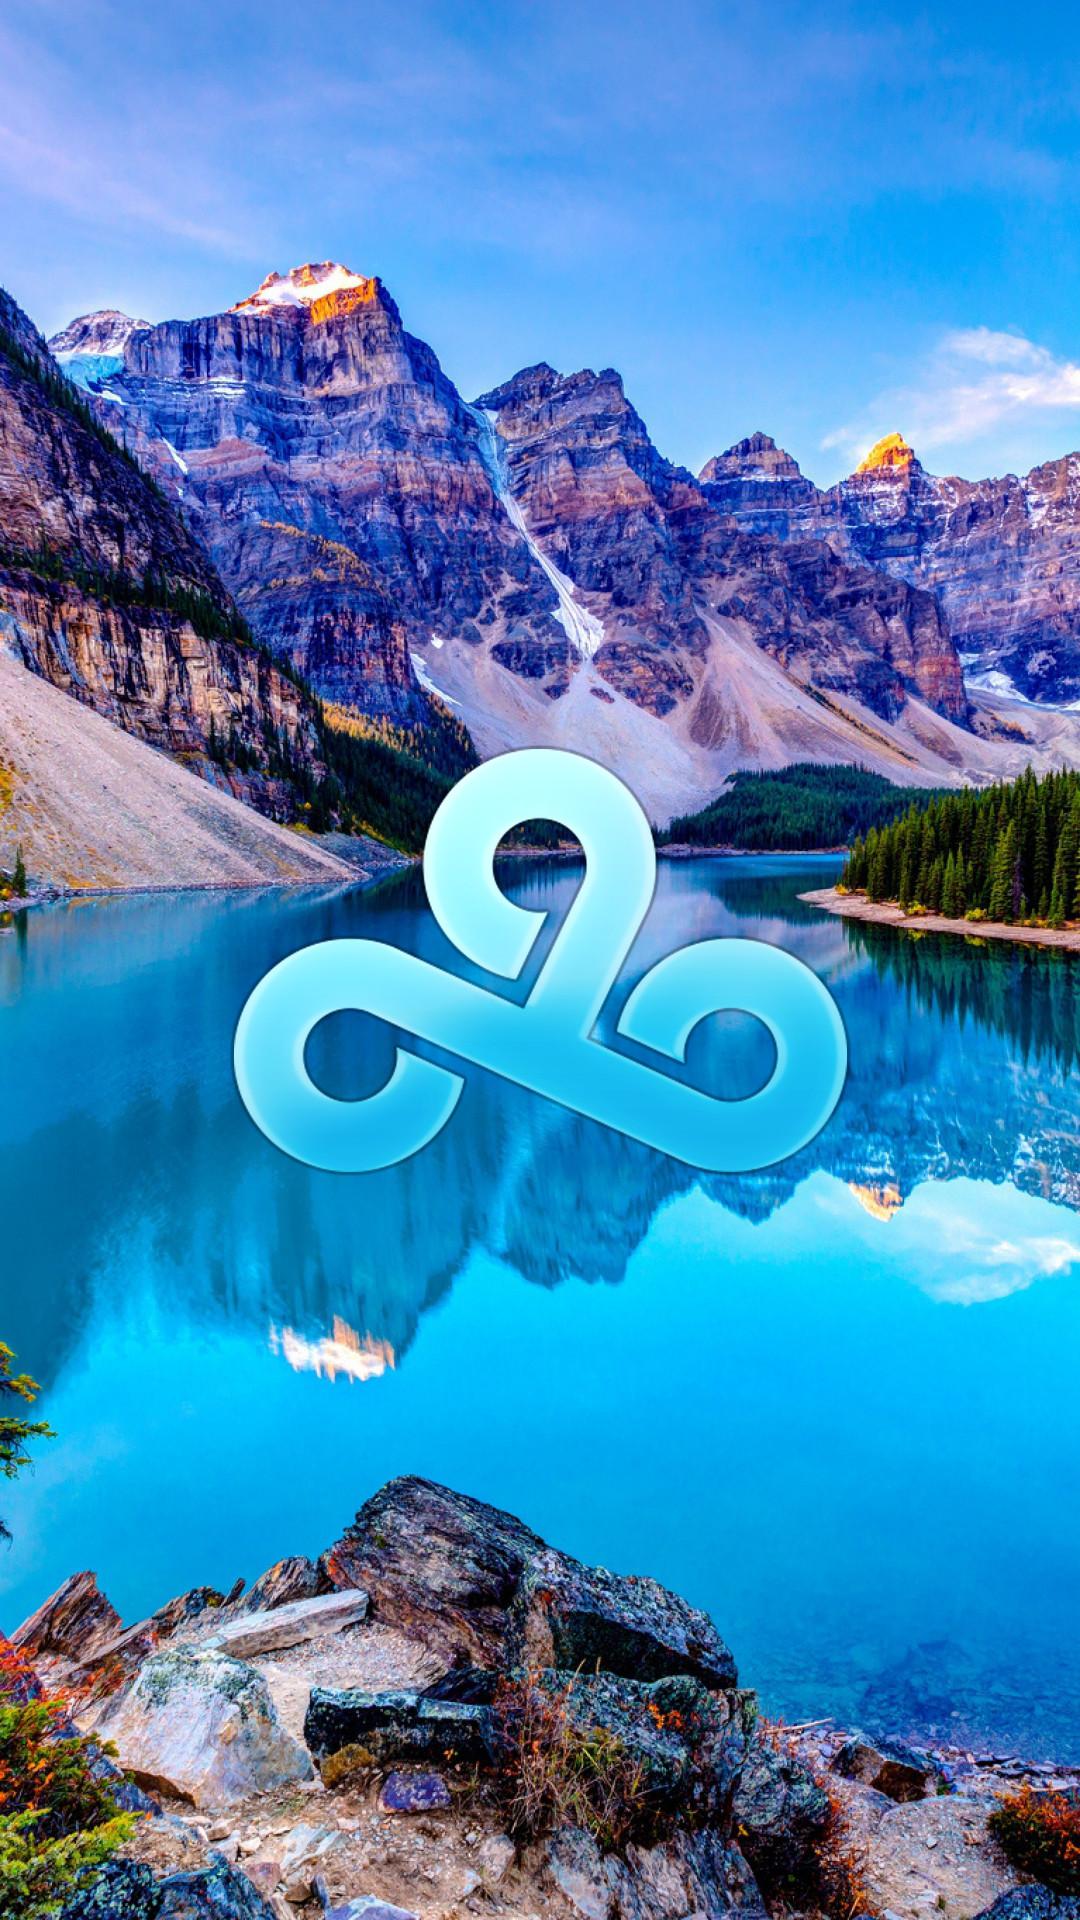 Cloud 9 Mountain Side